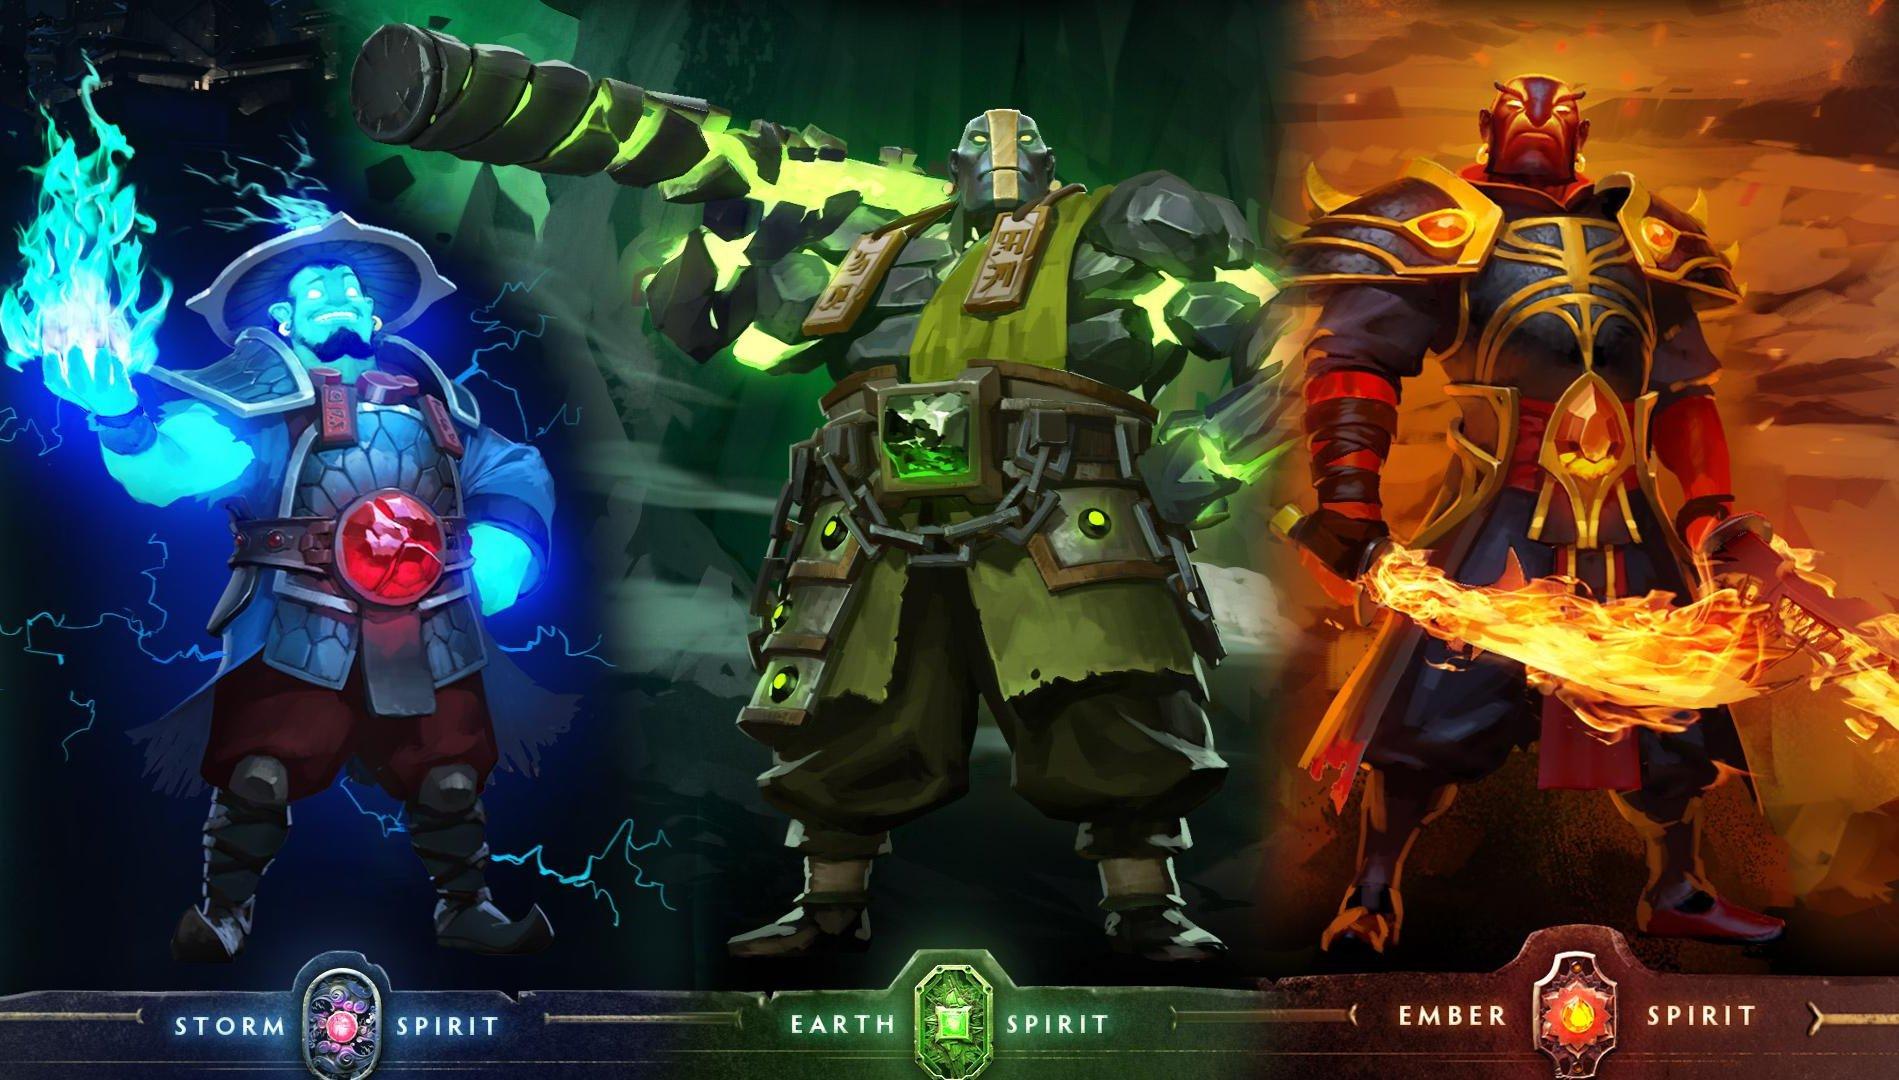 dota 2 update adds a trio of spirits and the return of diretide